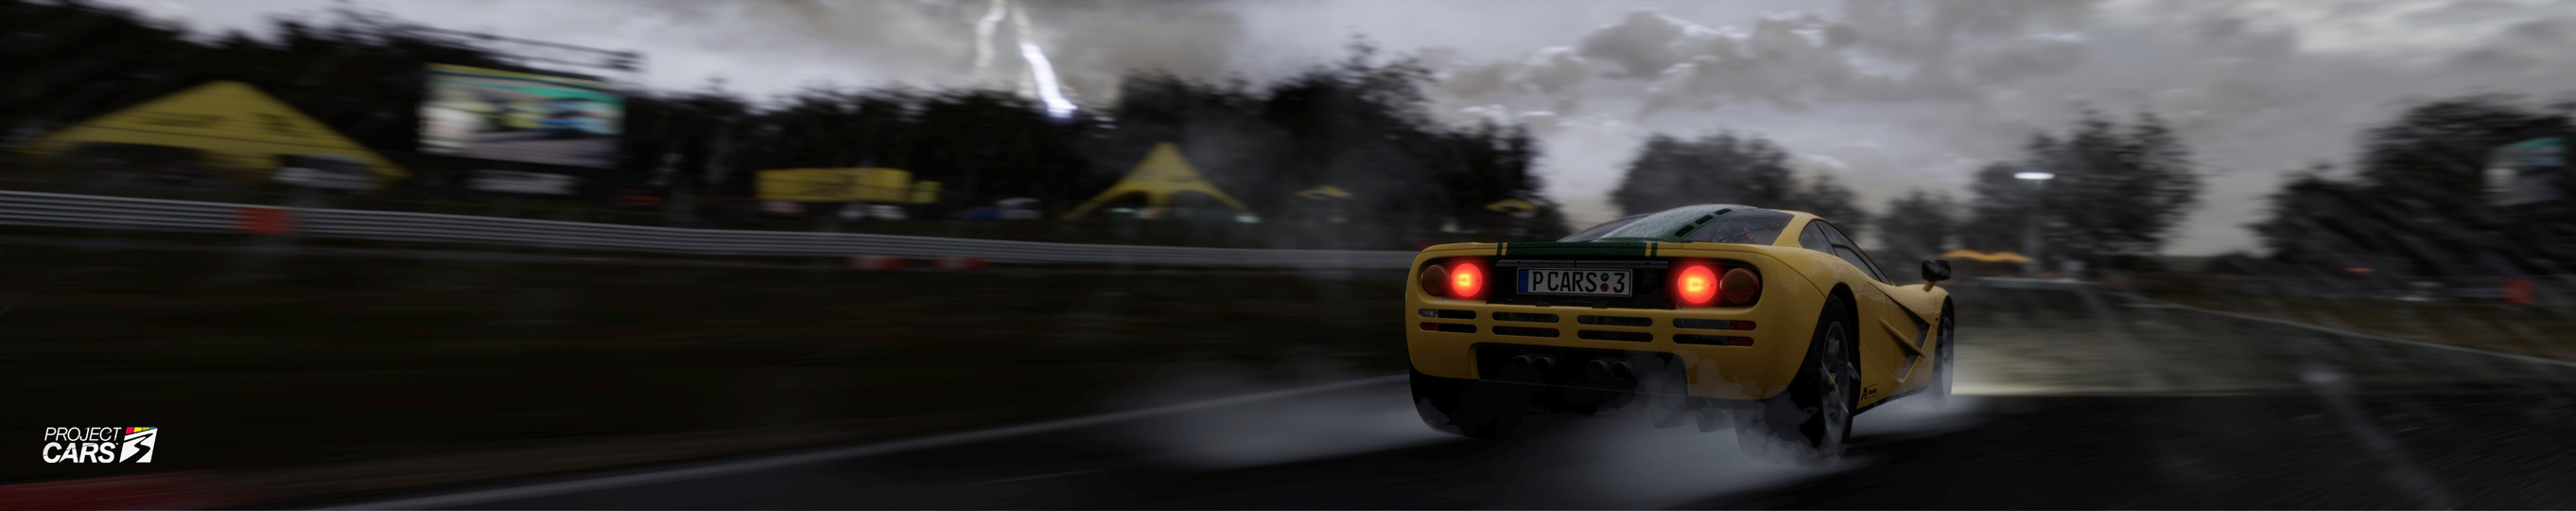 1 PROJECT CARS 3 Lightning at OULTON PARK crop copy.jpg